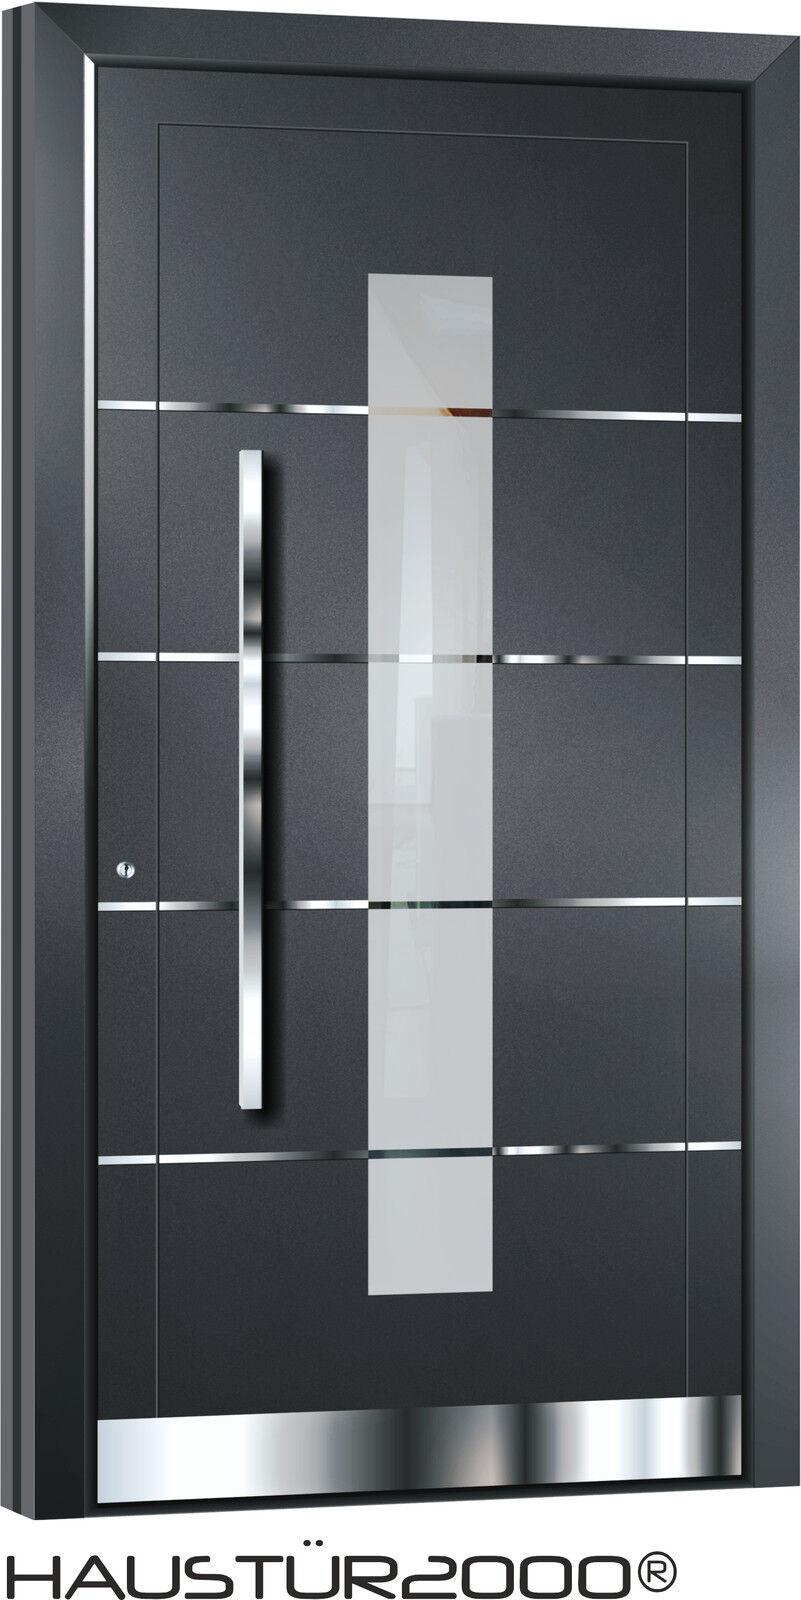 aluminium haust r alu haust ren t r t ren vollst ndig i deutschland gefertigt. Black Bedroom Furniture Sets. Home Design Ideas